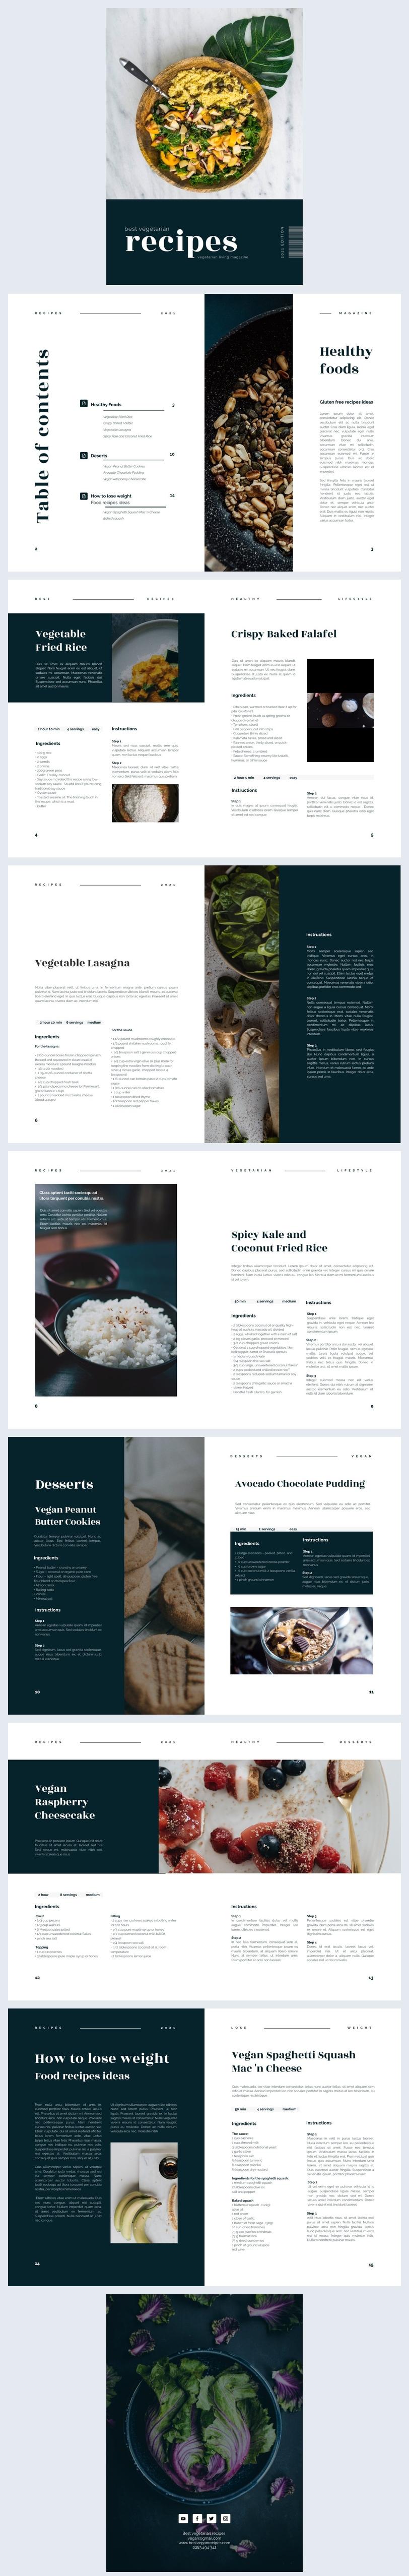 Interactive Vegetarian Magazine Design Example